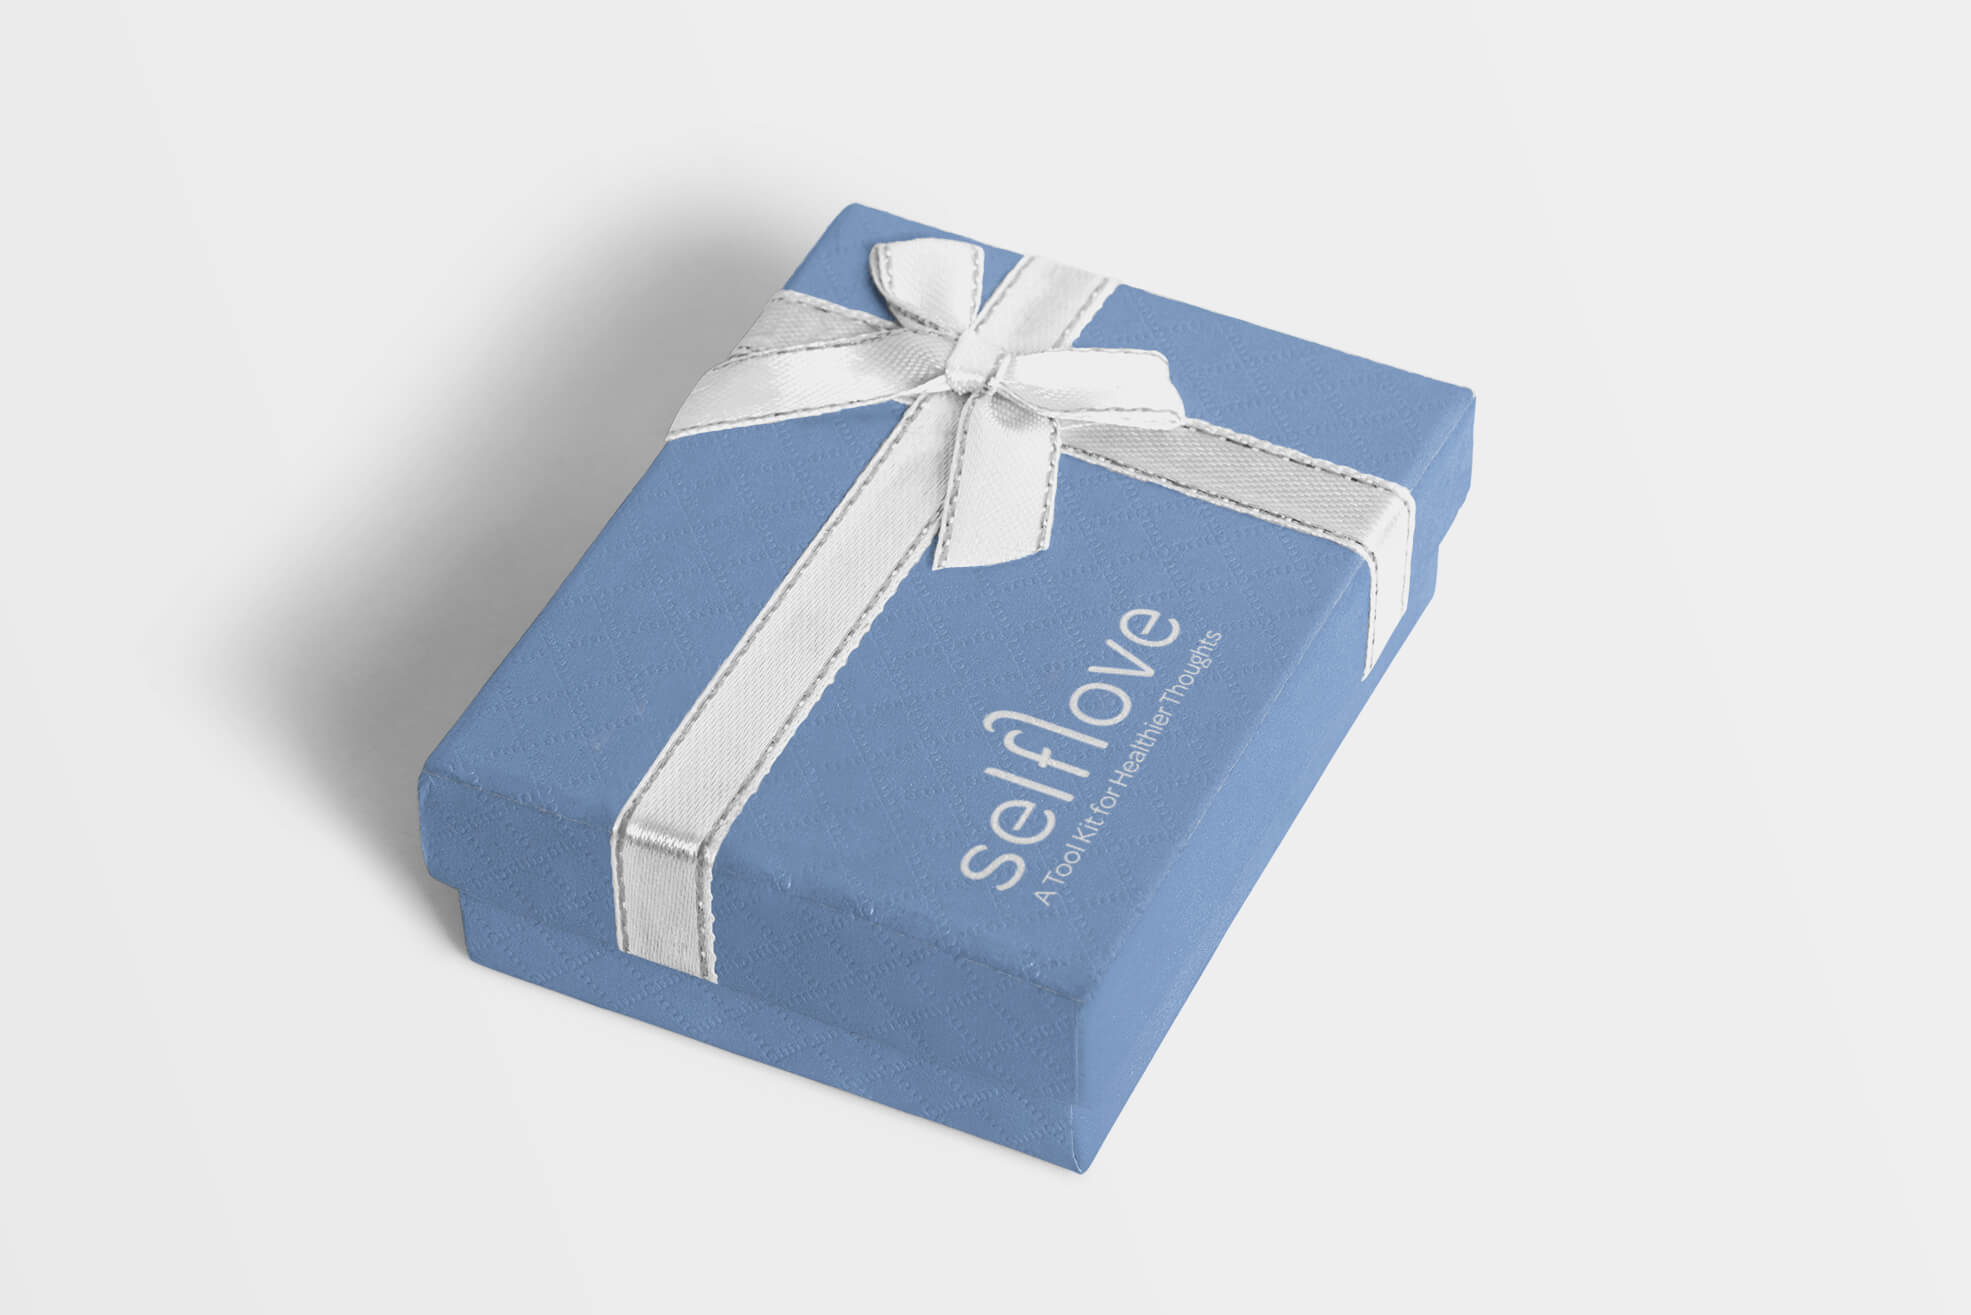 Selflove Box